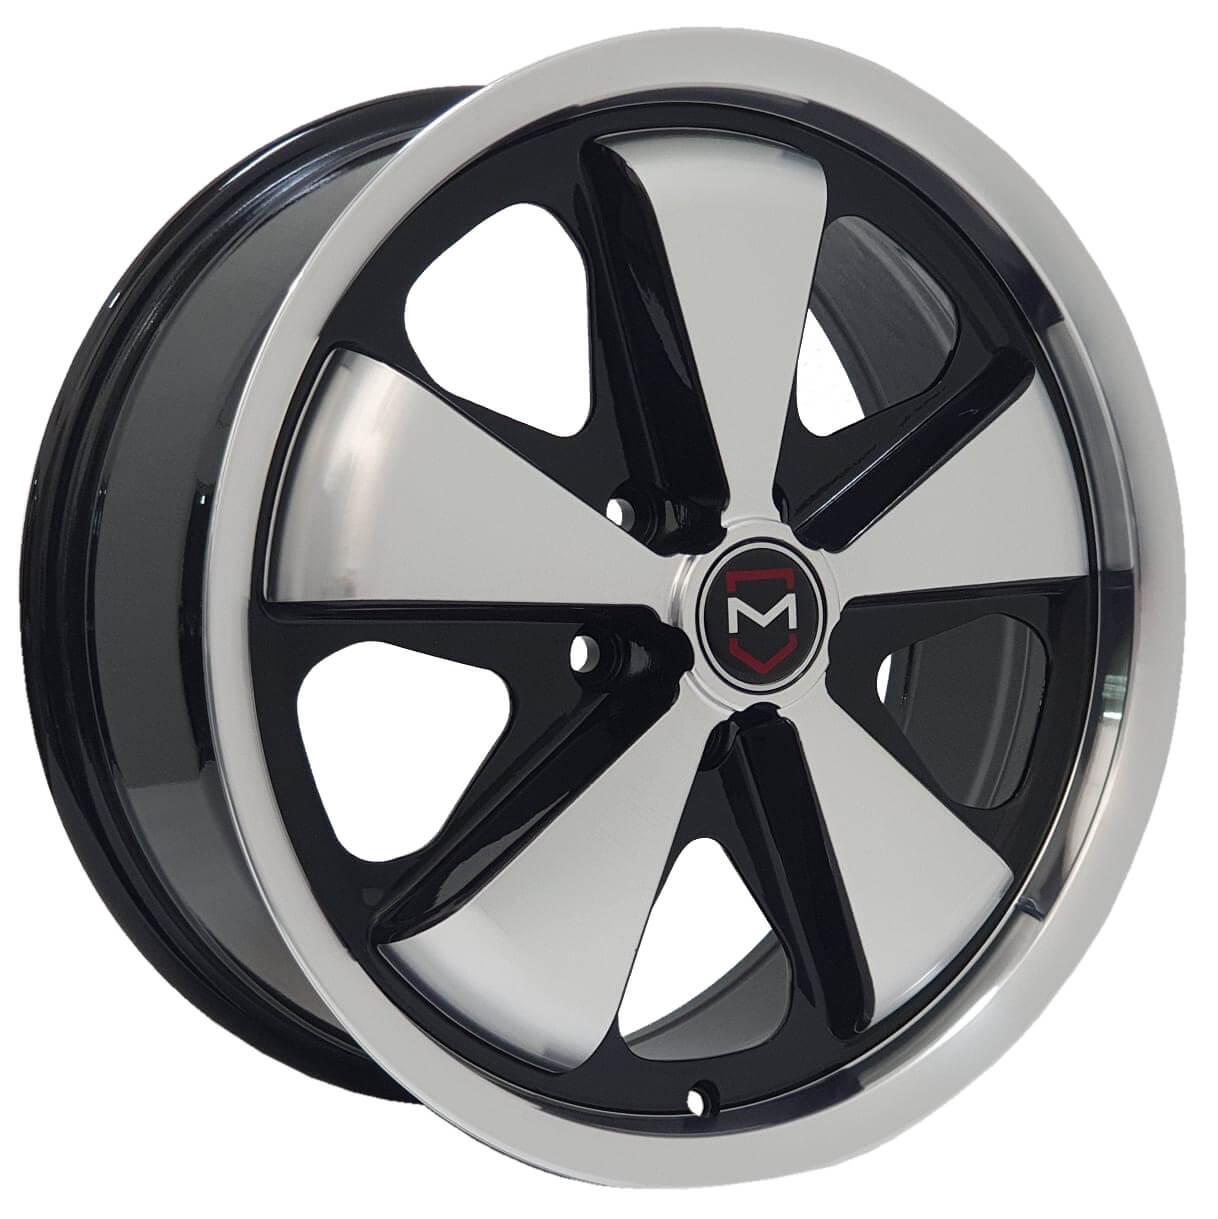 Jogo Rodas Monacco Wheels VLK-130 (FUCHS) Aro 17 5x100 Preto Diamantado Brilhante